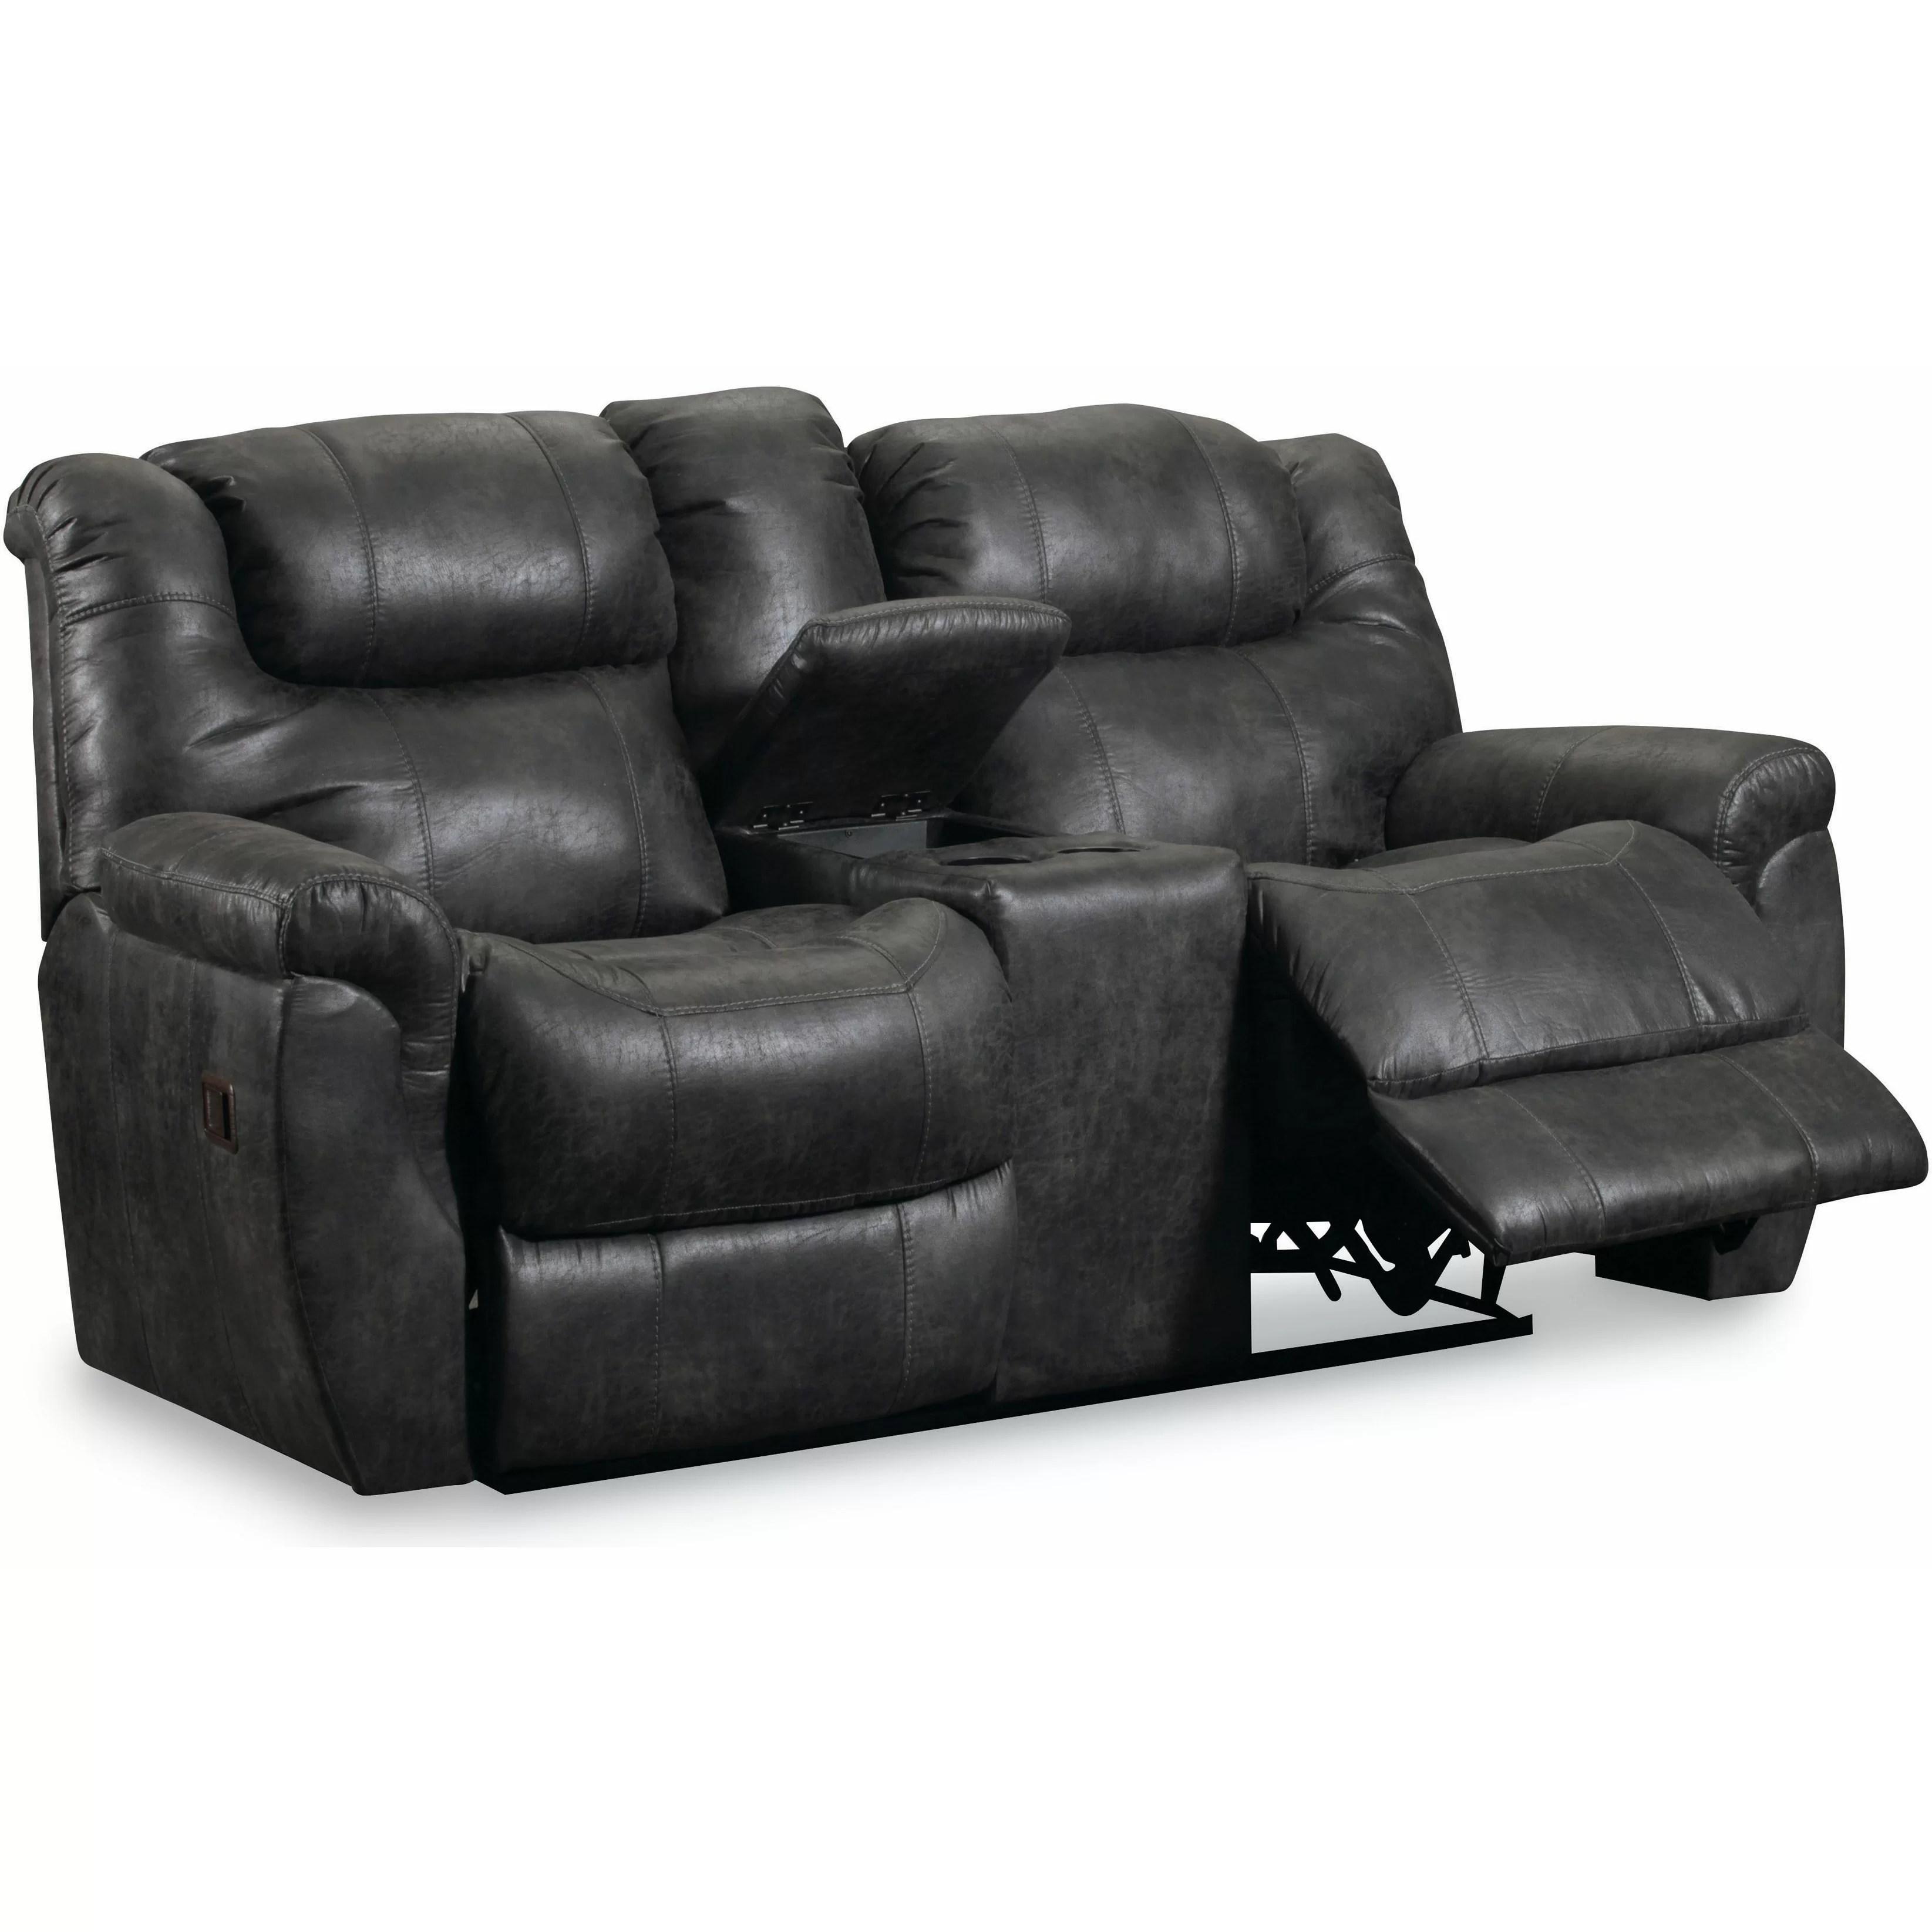 lane triple reclining sofa cushion filling birmingham furniture montgomery double loveseat